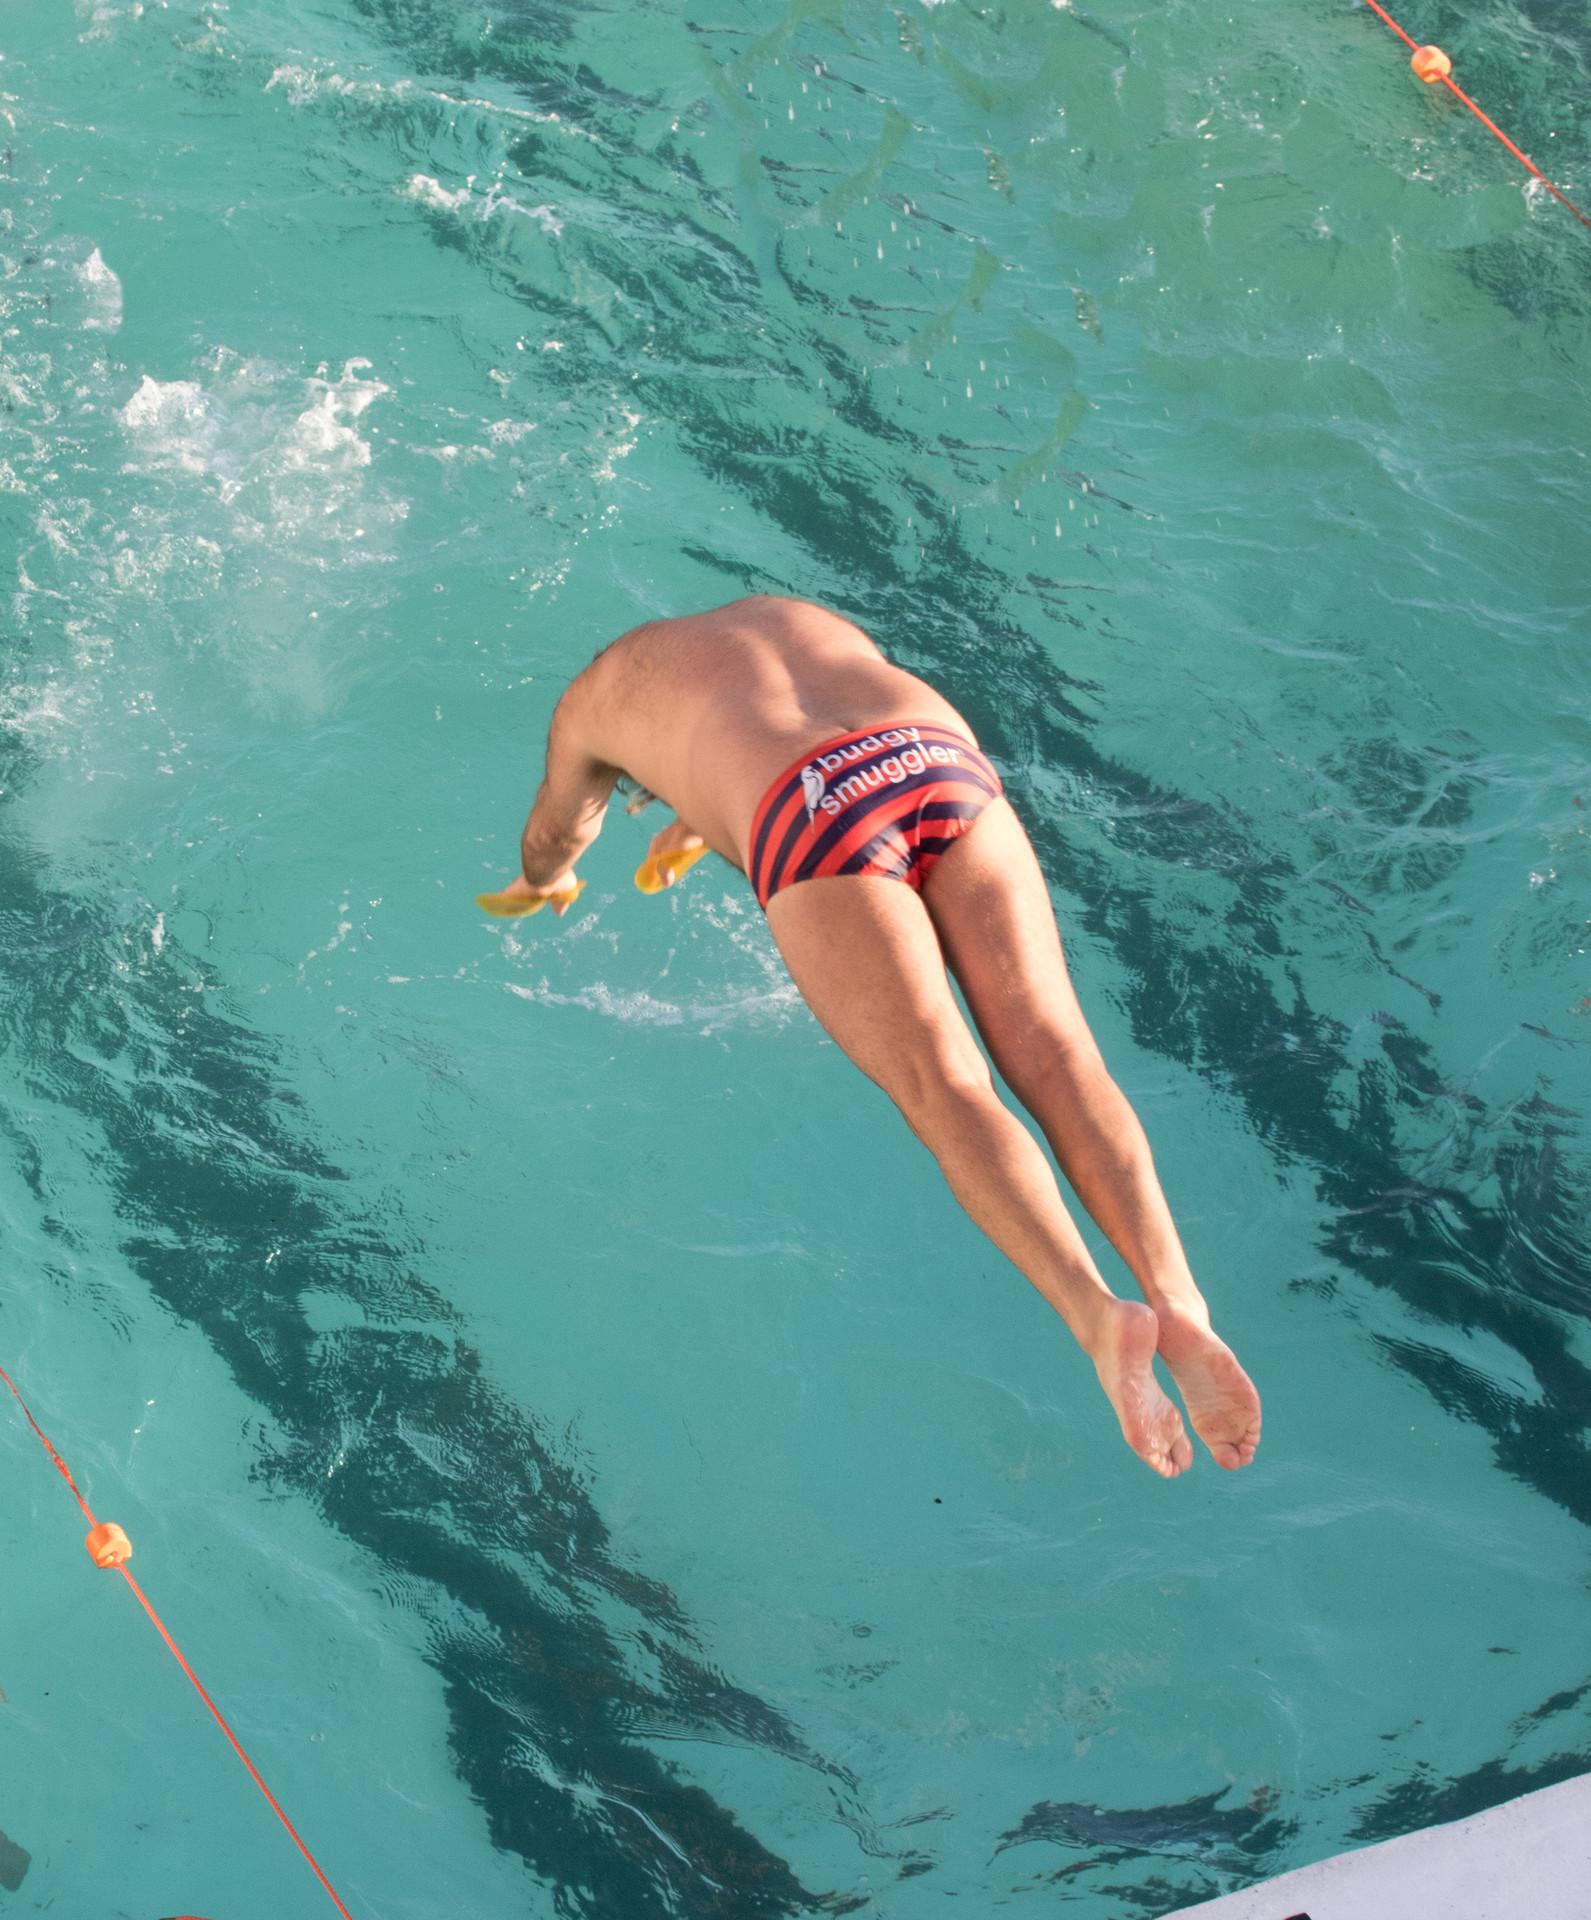 dive into Icebergs Pool, Bondi Beach